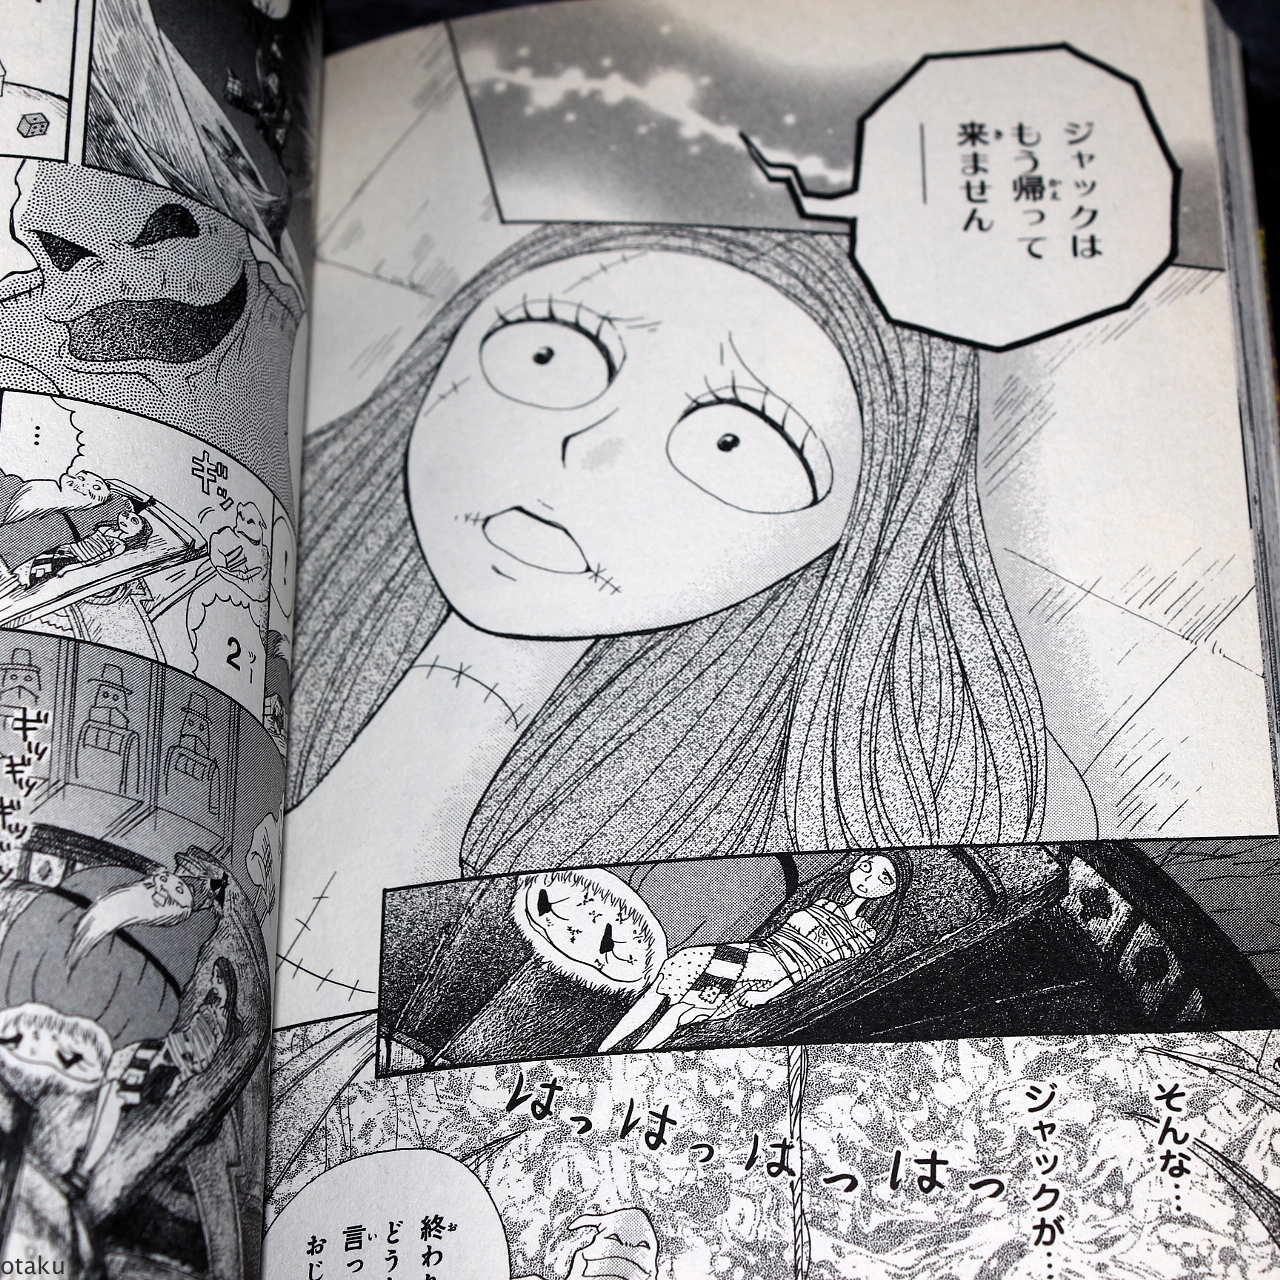 The original Japanese-language release of the  Nightmare Before Christmas  manga.